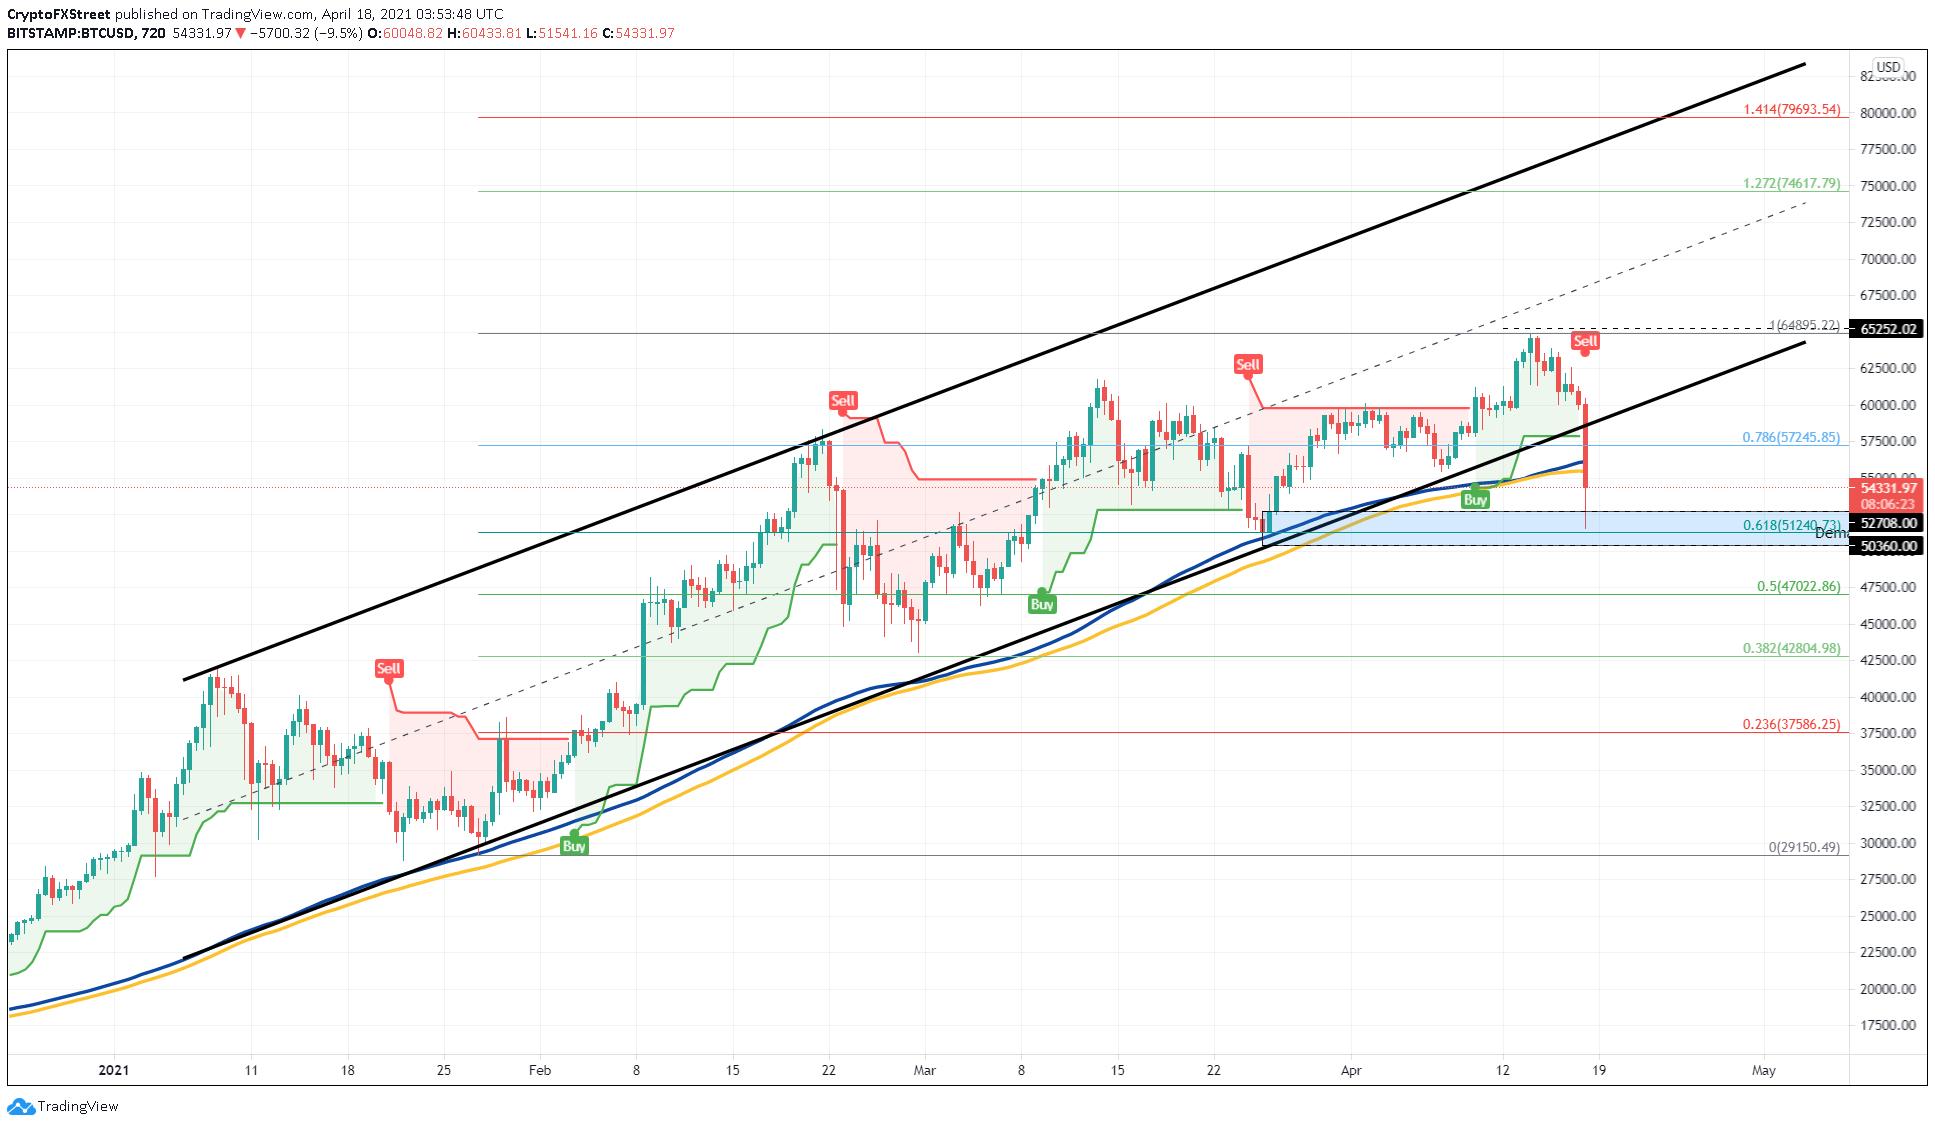 BTC/USD 12-hour chart